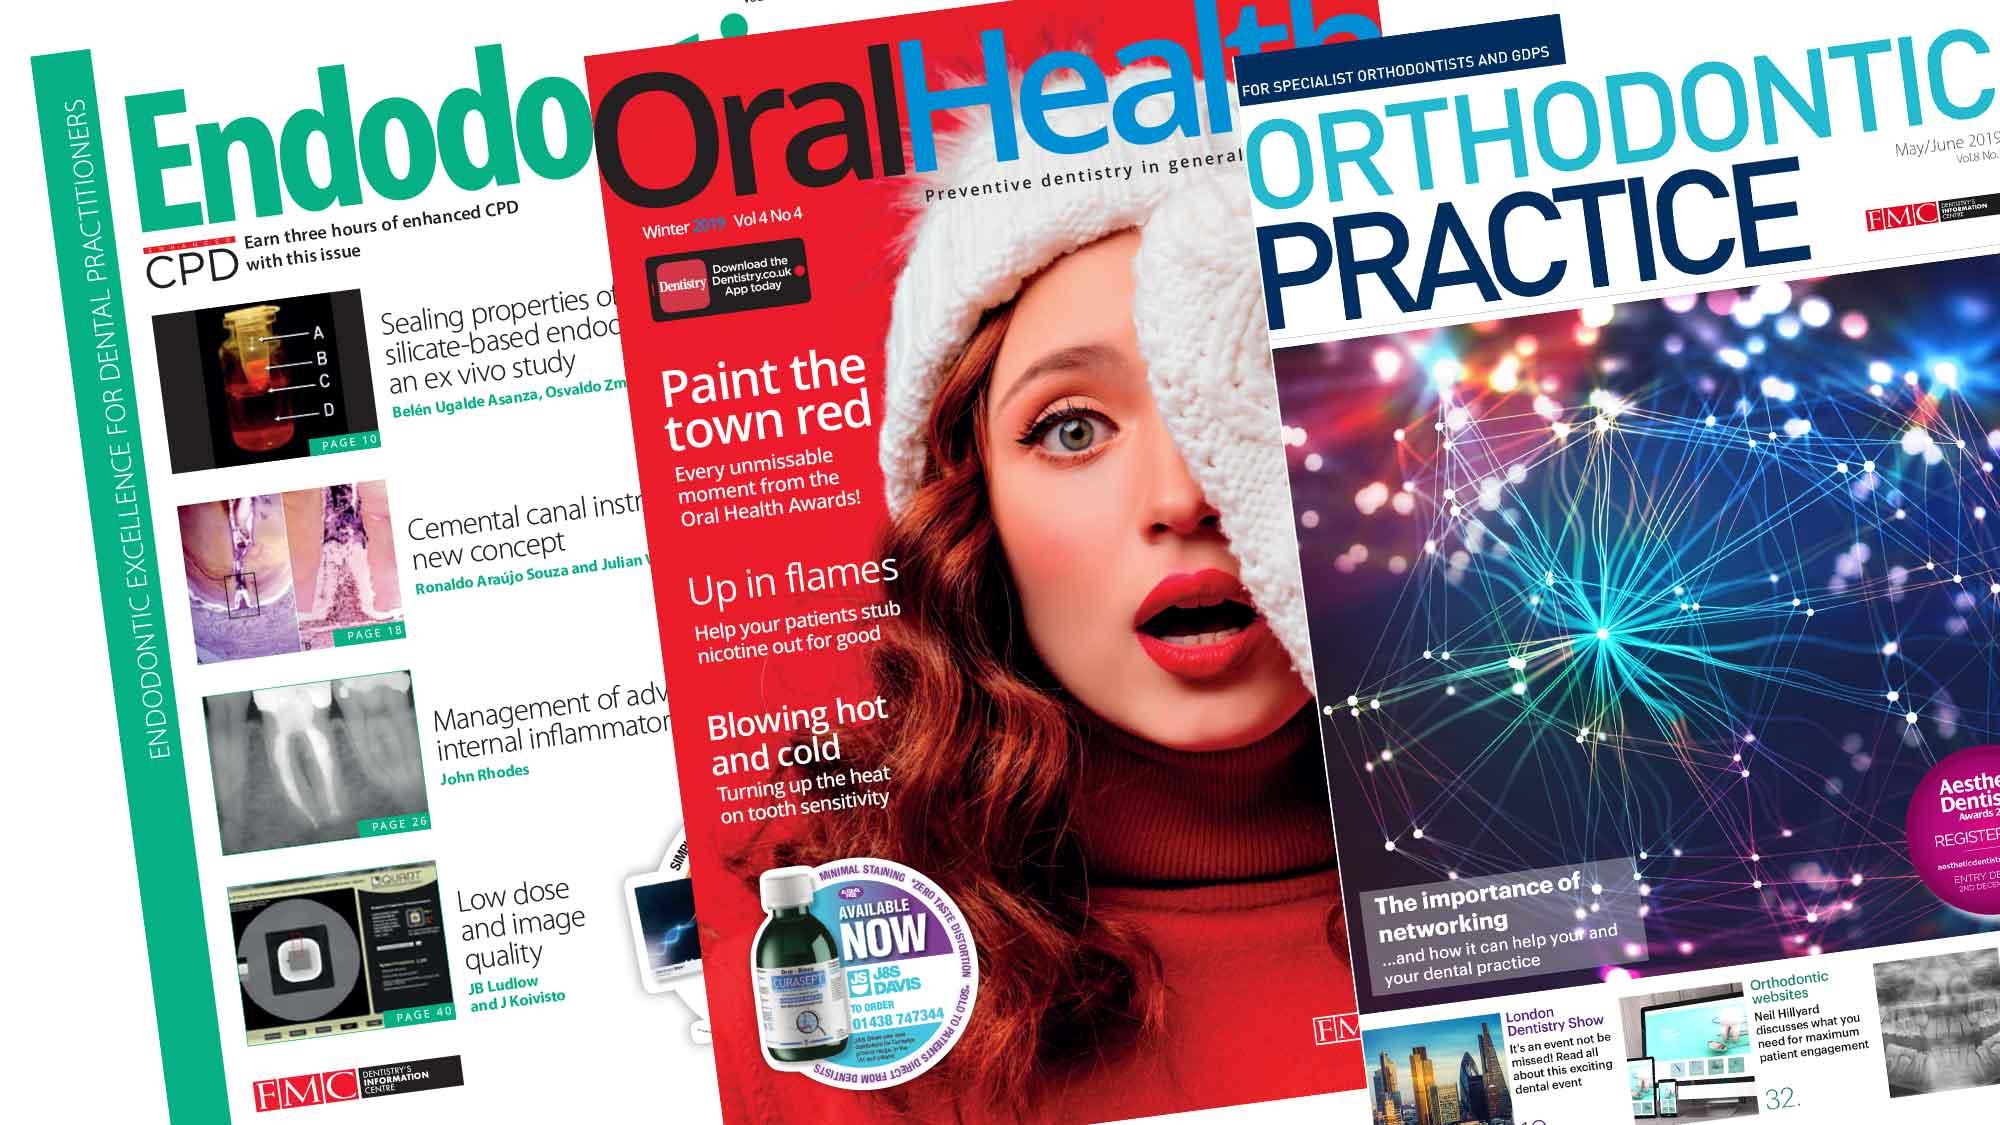 endodontic practice, oral health and orthodontic practice magazines